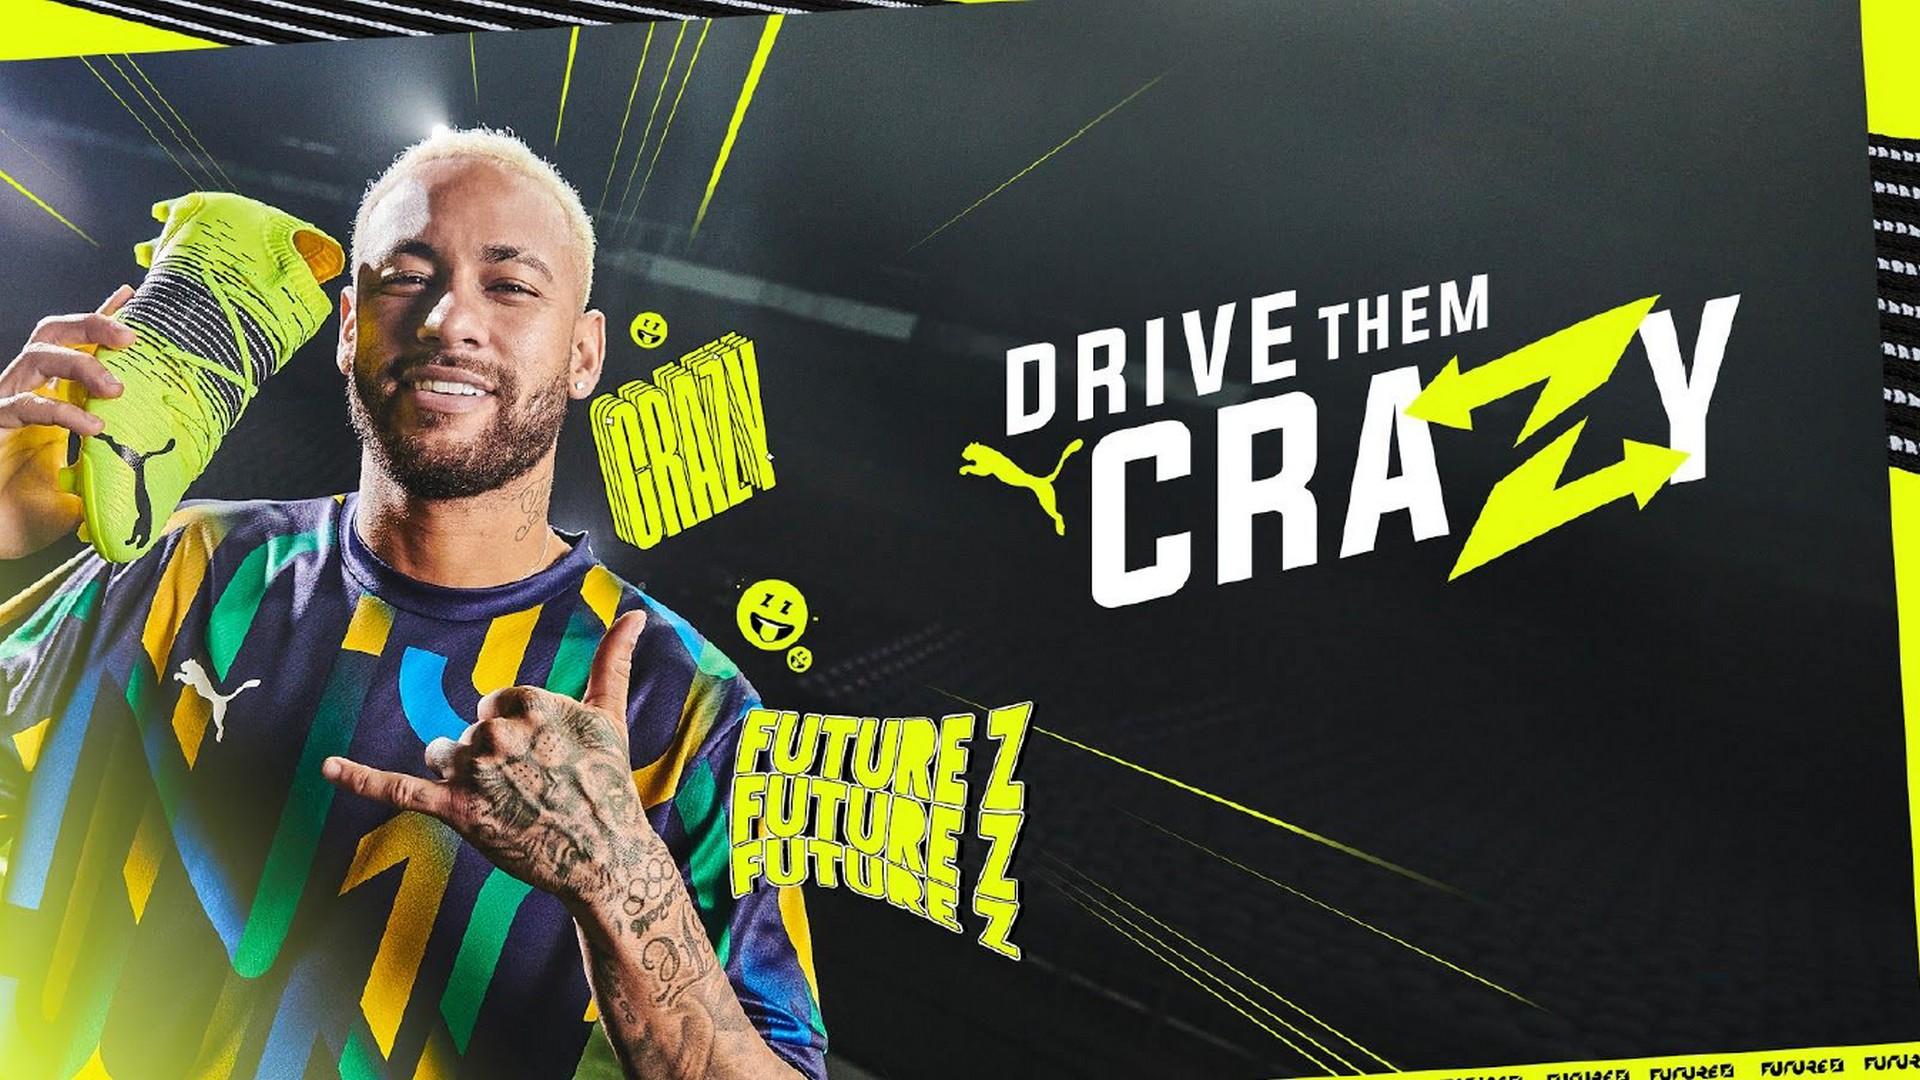 Puma x Neymarj (Football) Publicité 2021 (1)